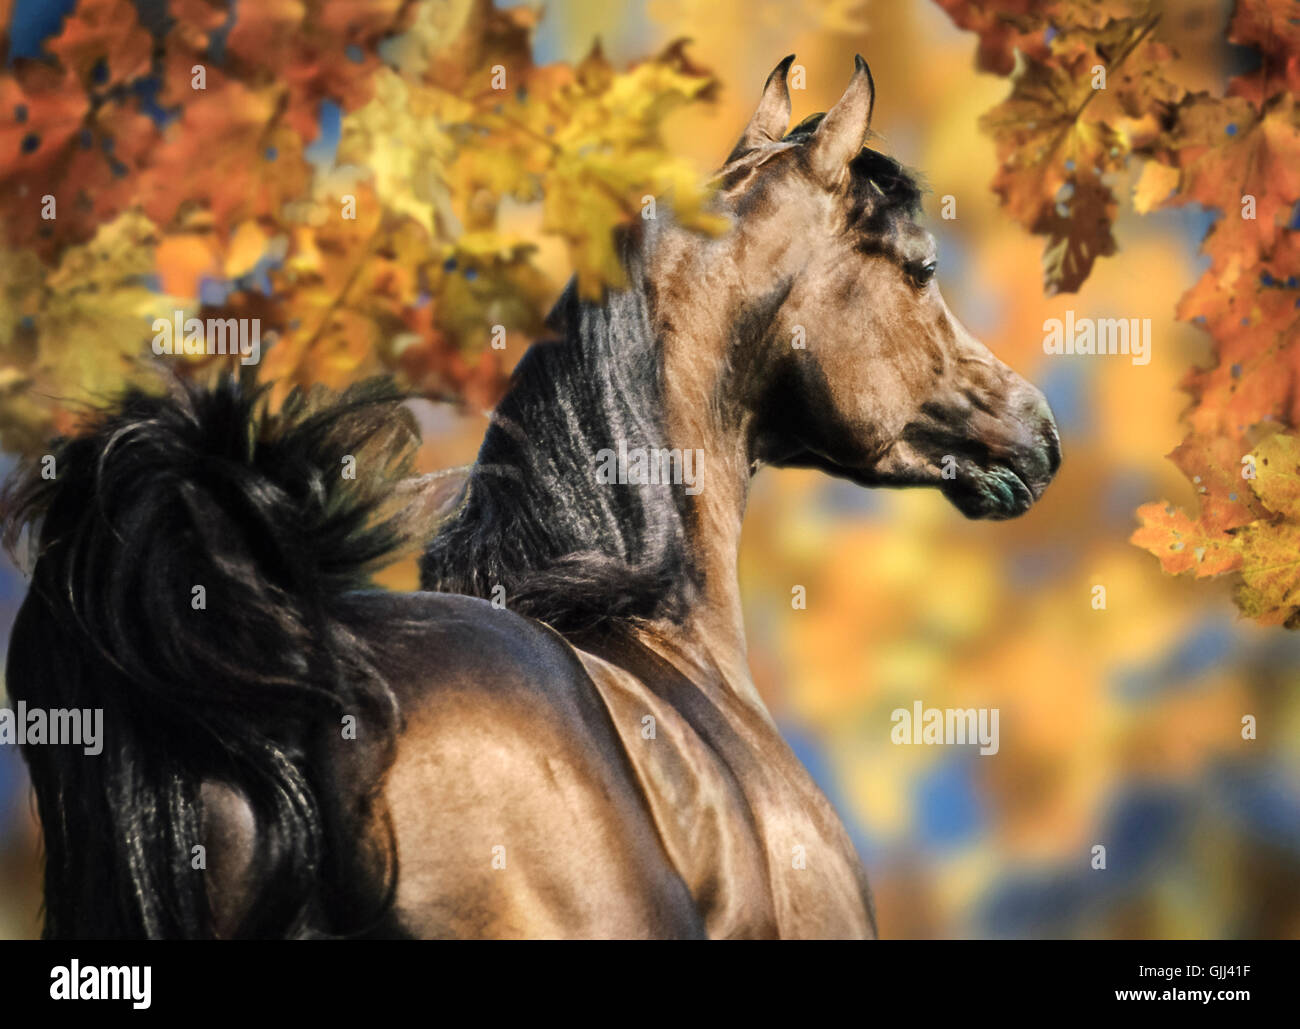 Arabian stallion running amidst fall foiliage. - Stock Image